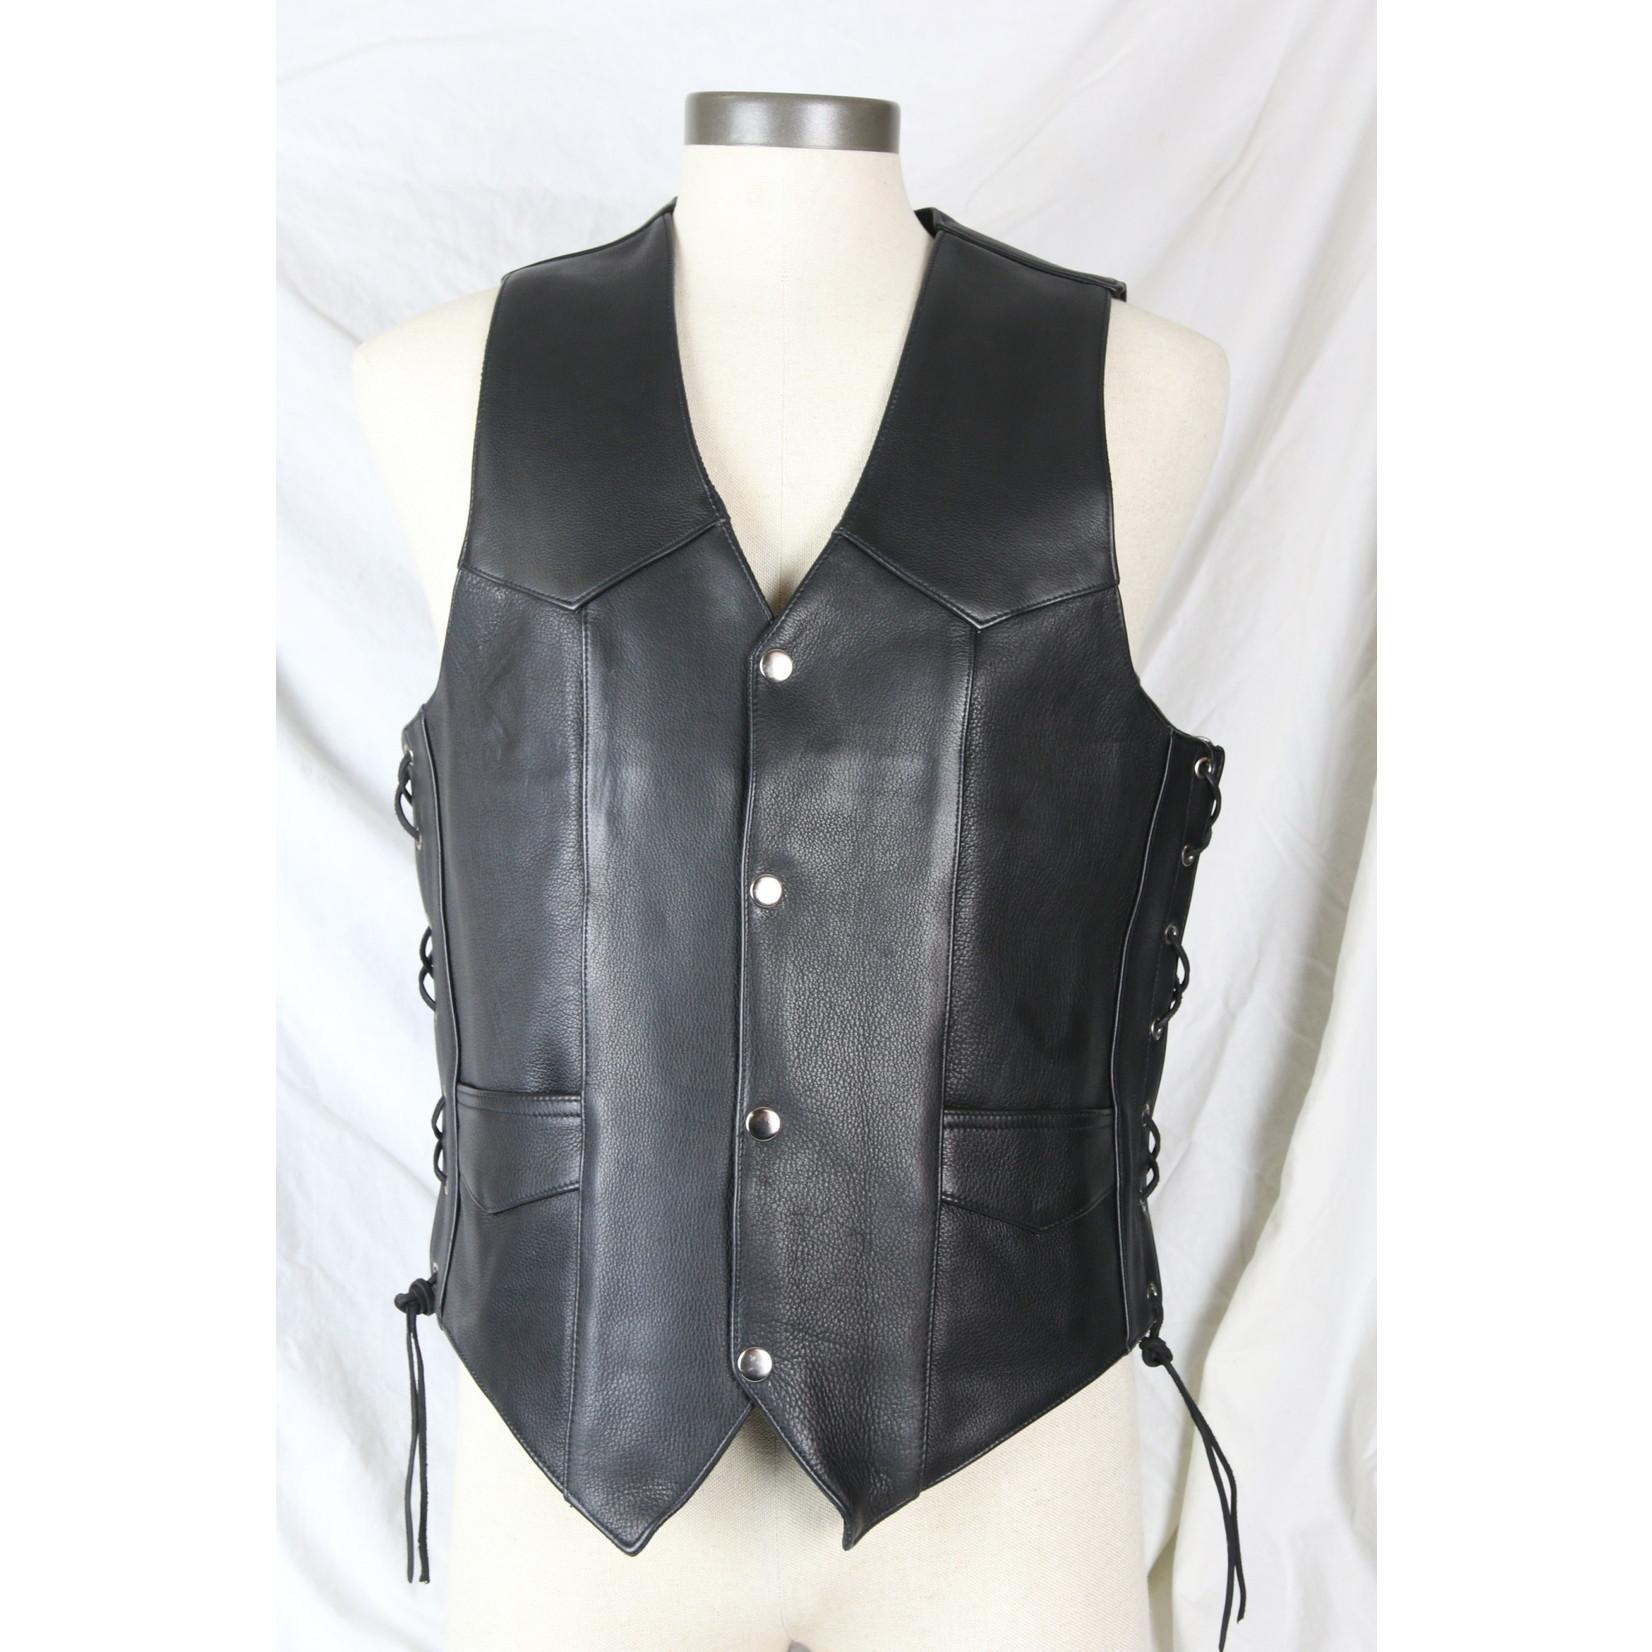 Cruiser by Sofari Kids Leather Biker Vest Cinch Lace Waist KD-392